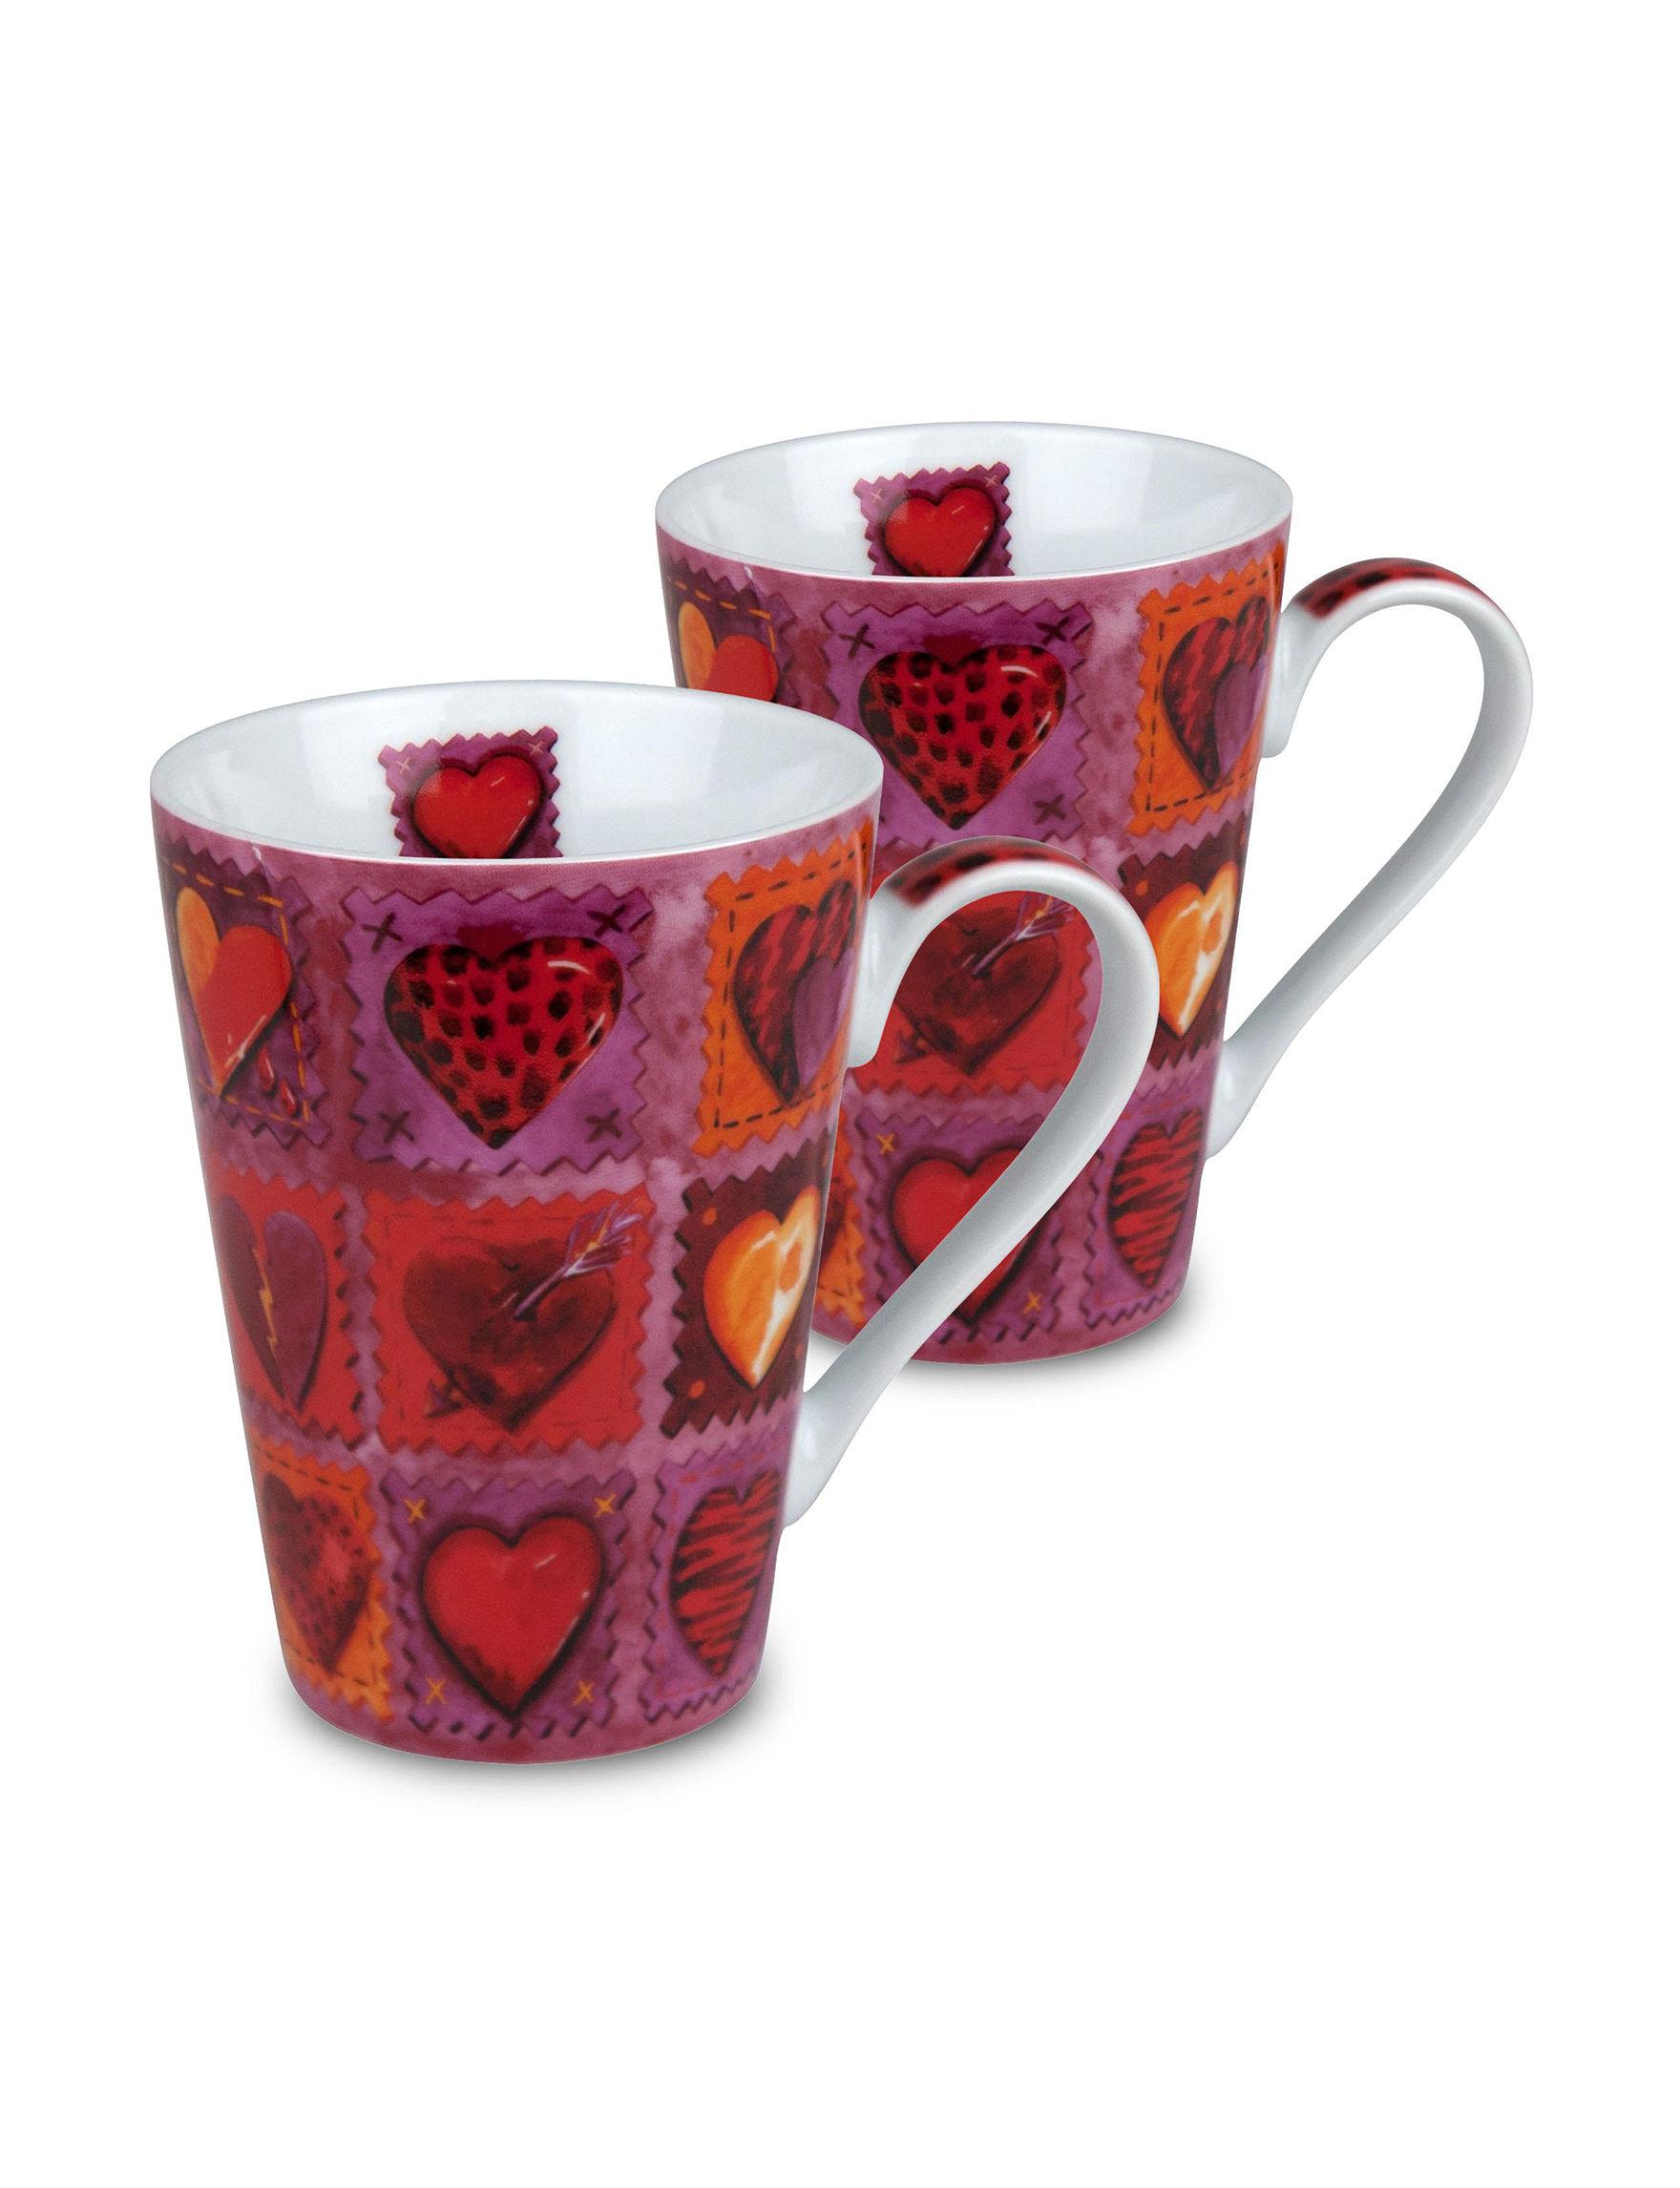 Konitz Clear Mugs Drinkware